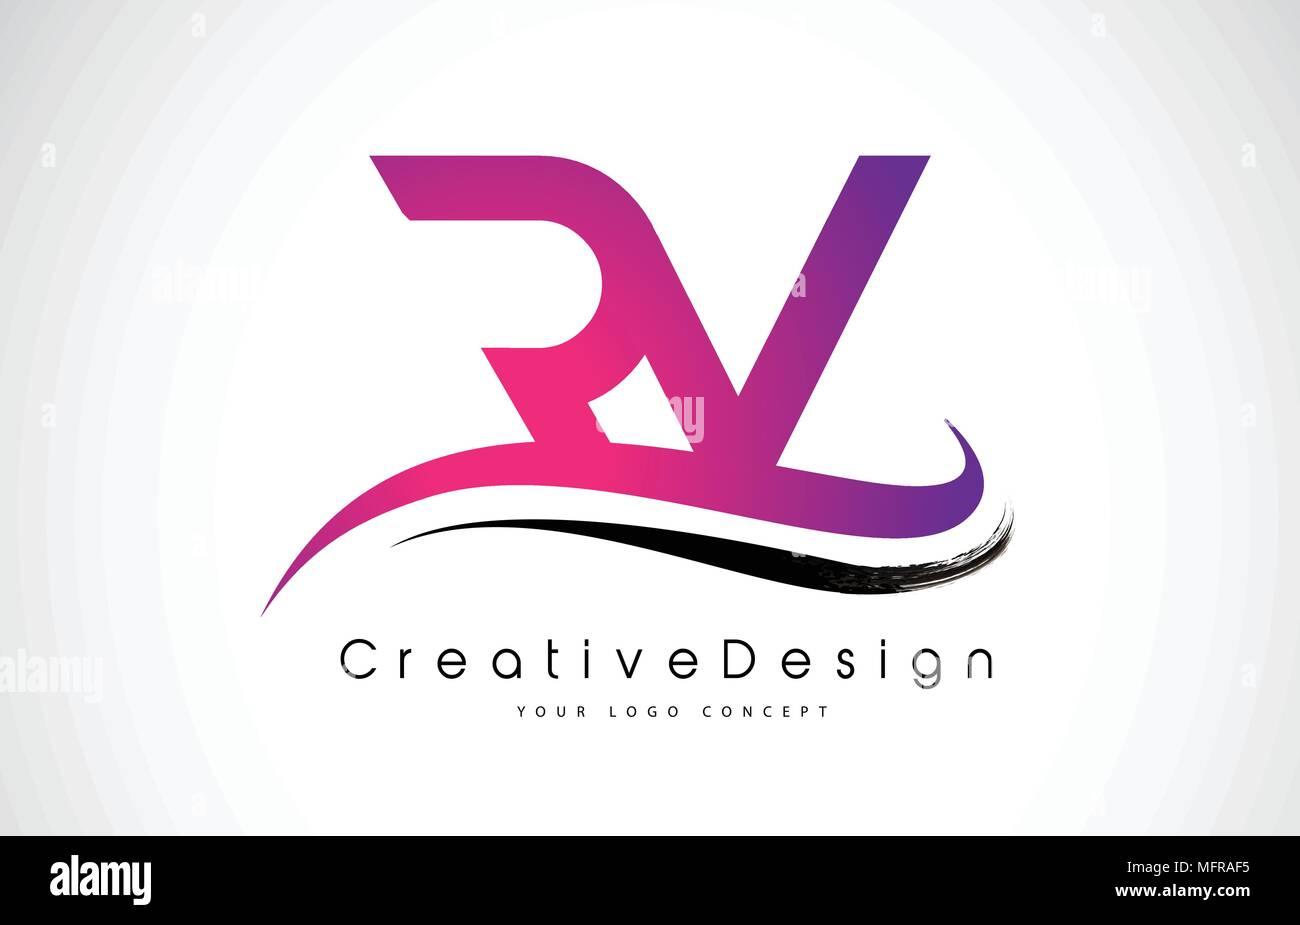 RV R V Letter Logo Design in Black Colors. Creative Modern Letters ...